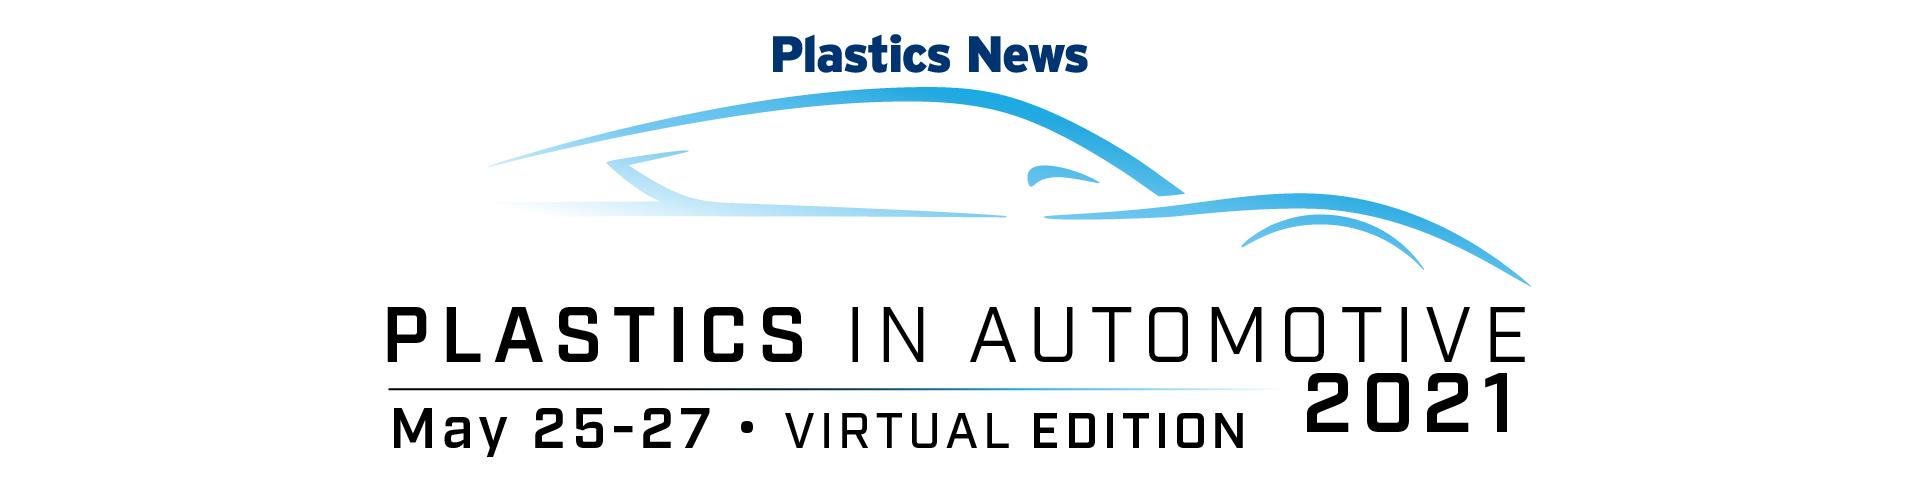 Plastics in Automotive 2021 Virtual Edition